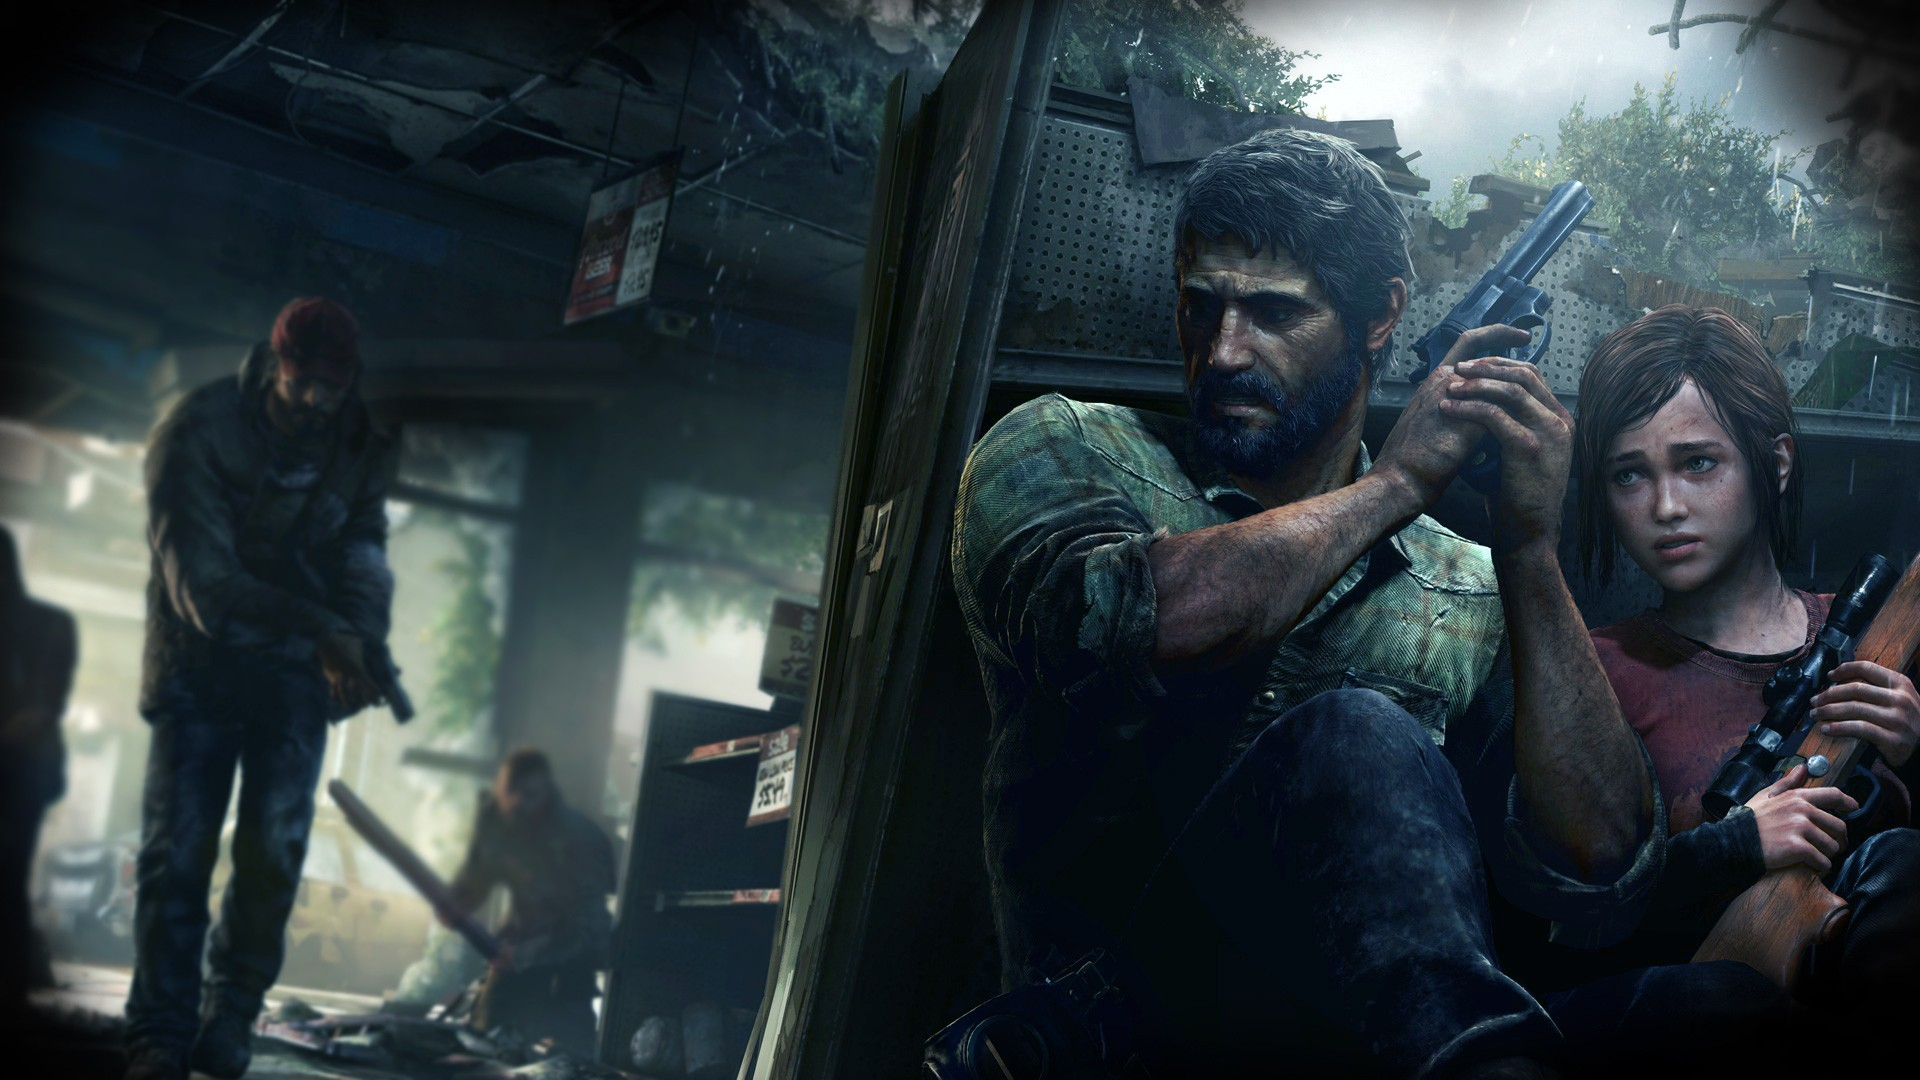 The Last of Us Review – Κυκλοφορεί αποκλειστικά για PS4